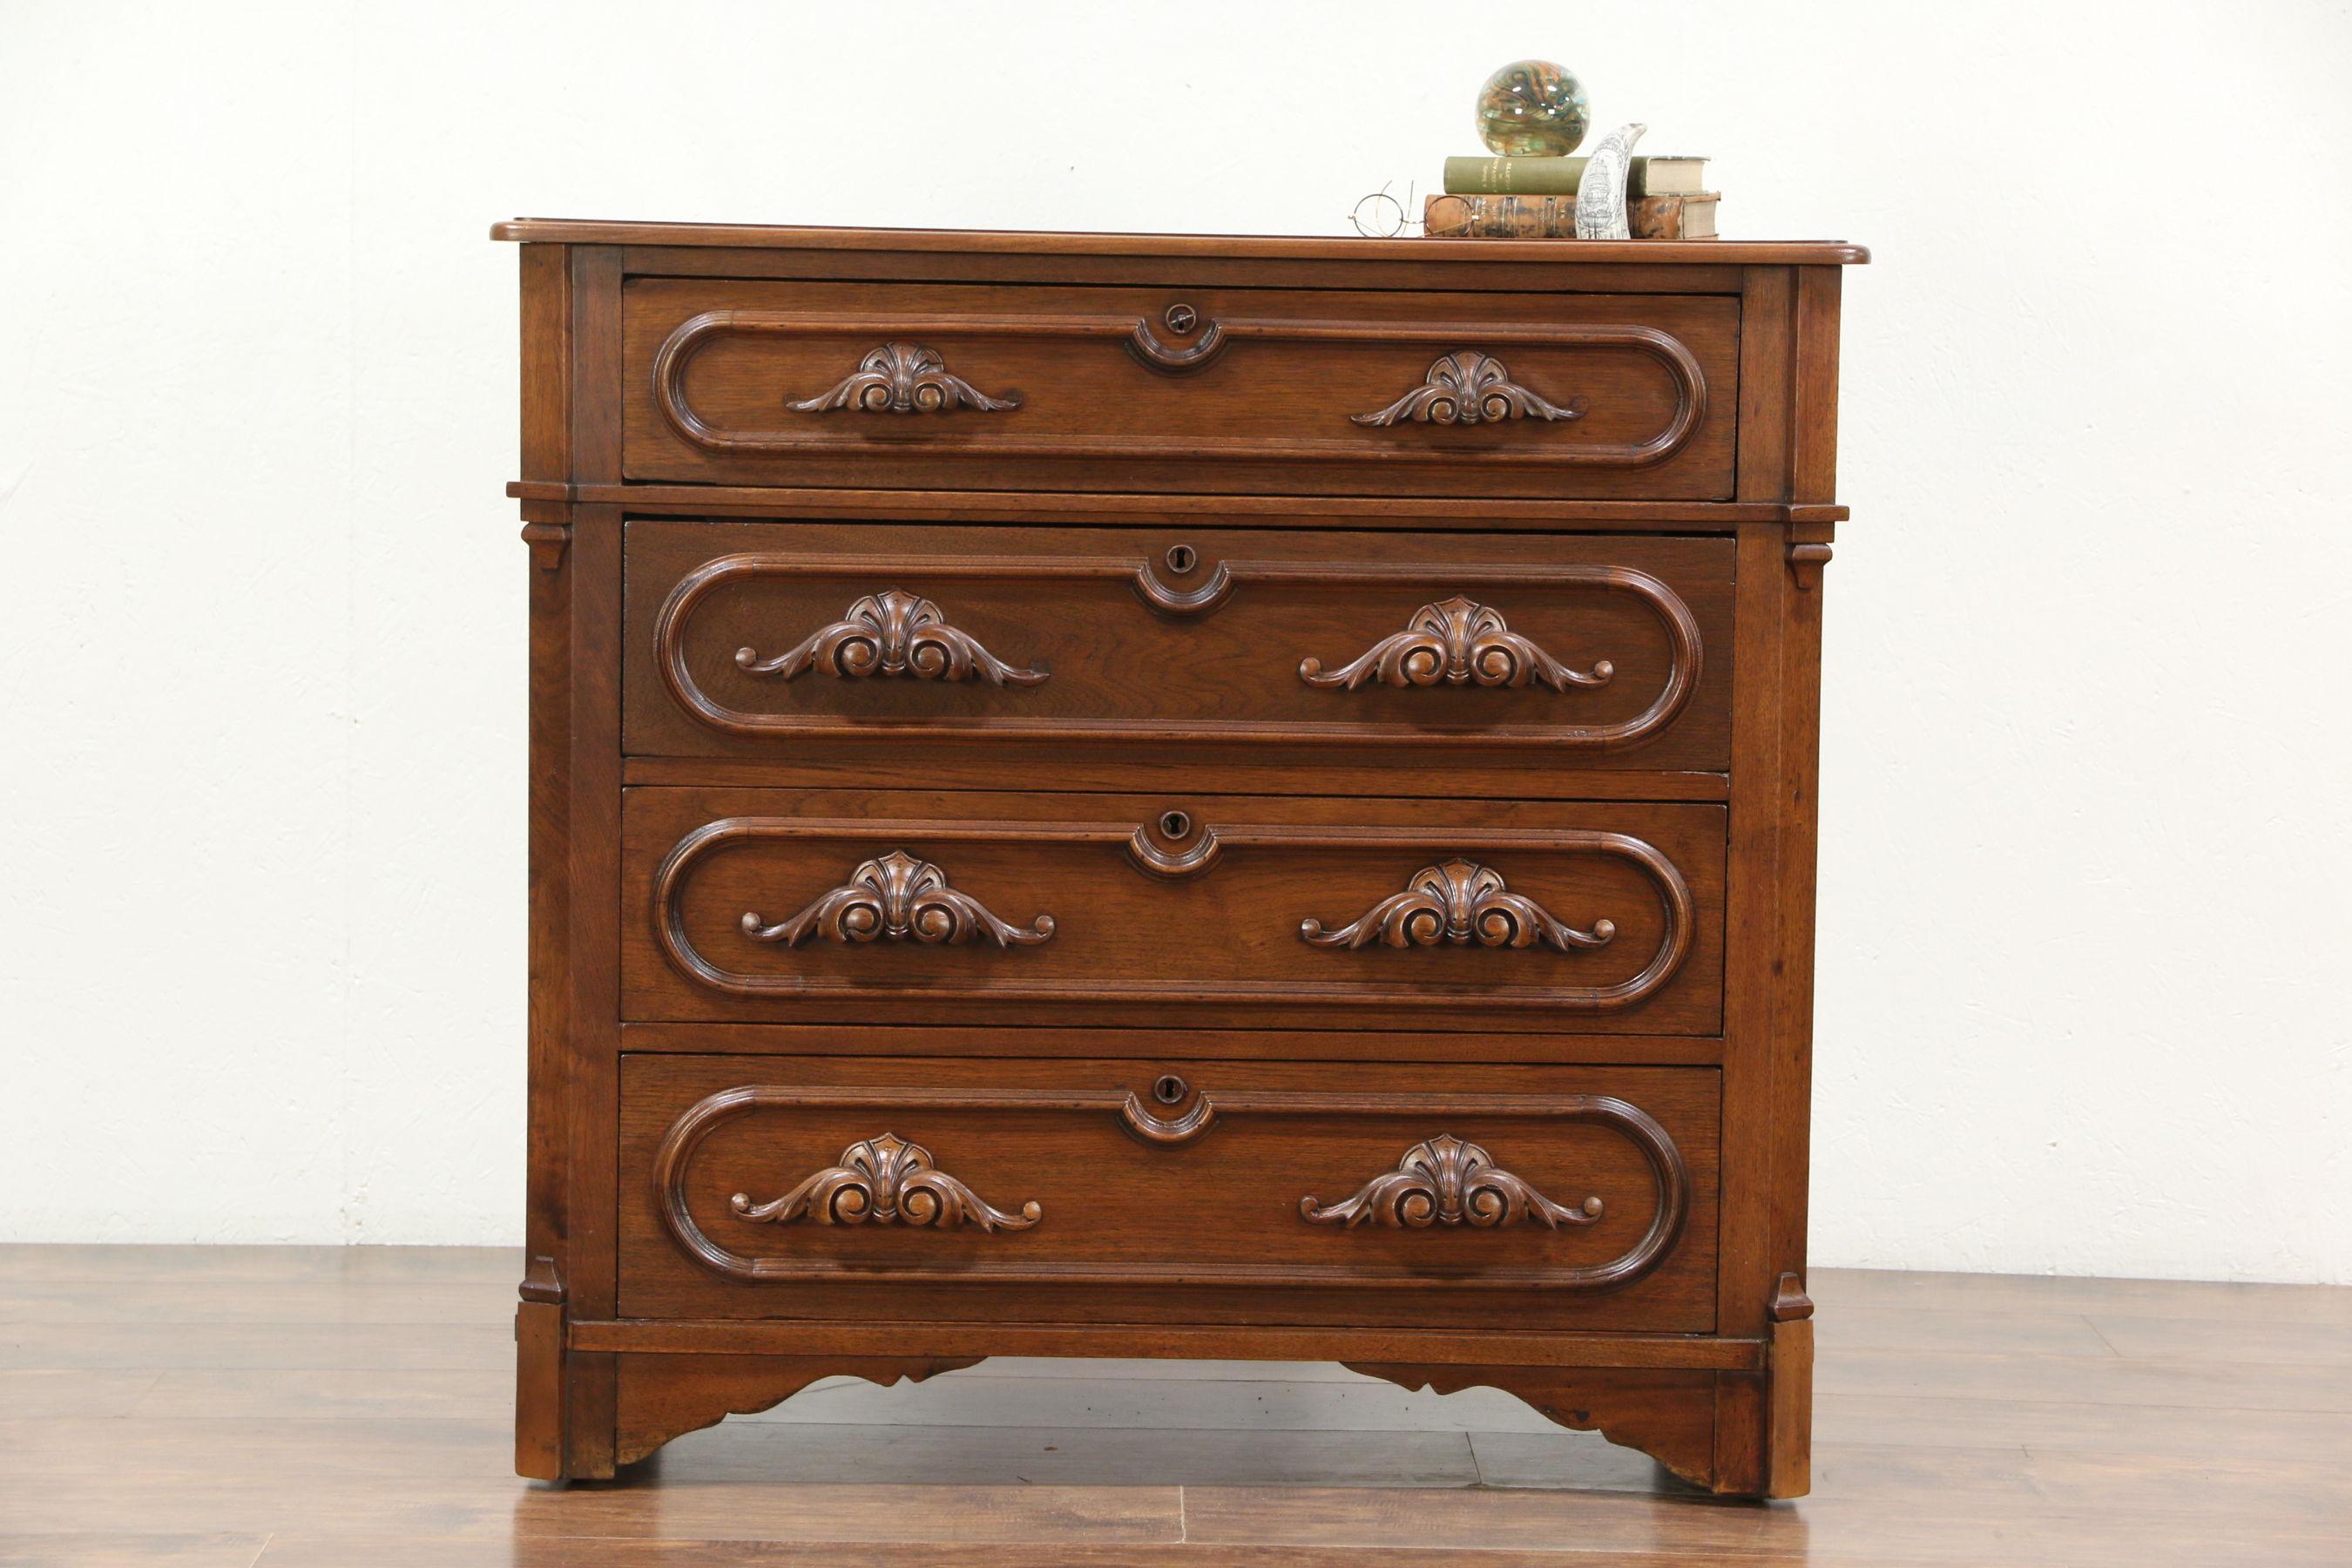 mawr pennsylvania college wright desk breuer auction marcel design bookshelf october of dresser bryn for and auctions